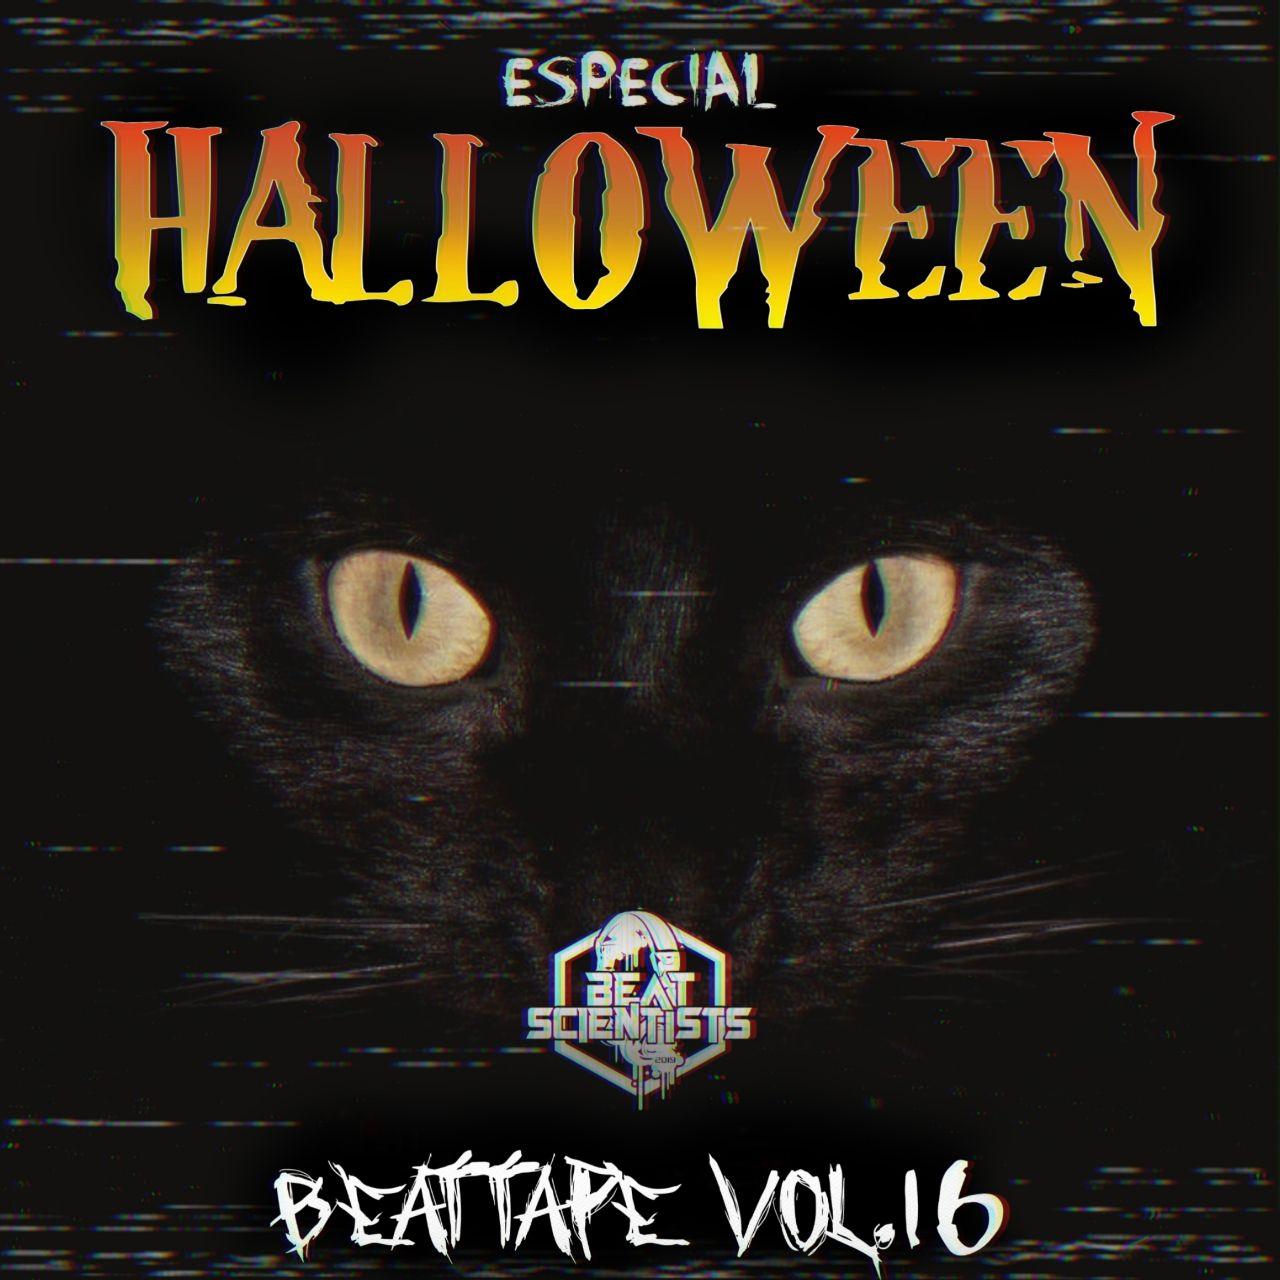 Beat scientist – Beattape Vol. 16 – Halloween (Instrumentales)